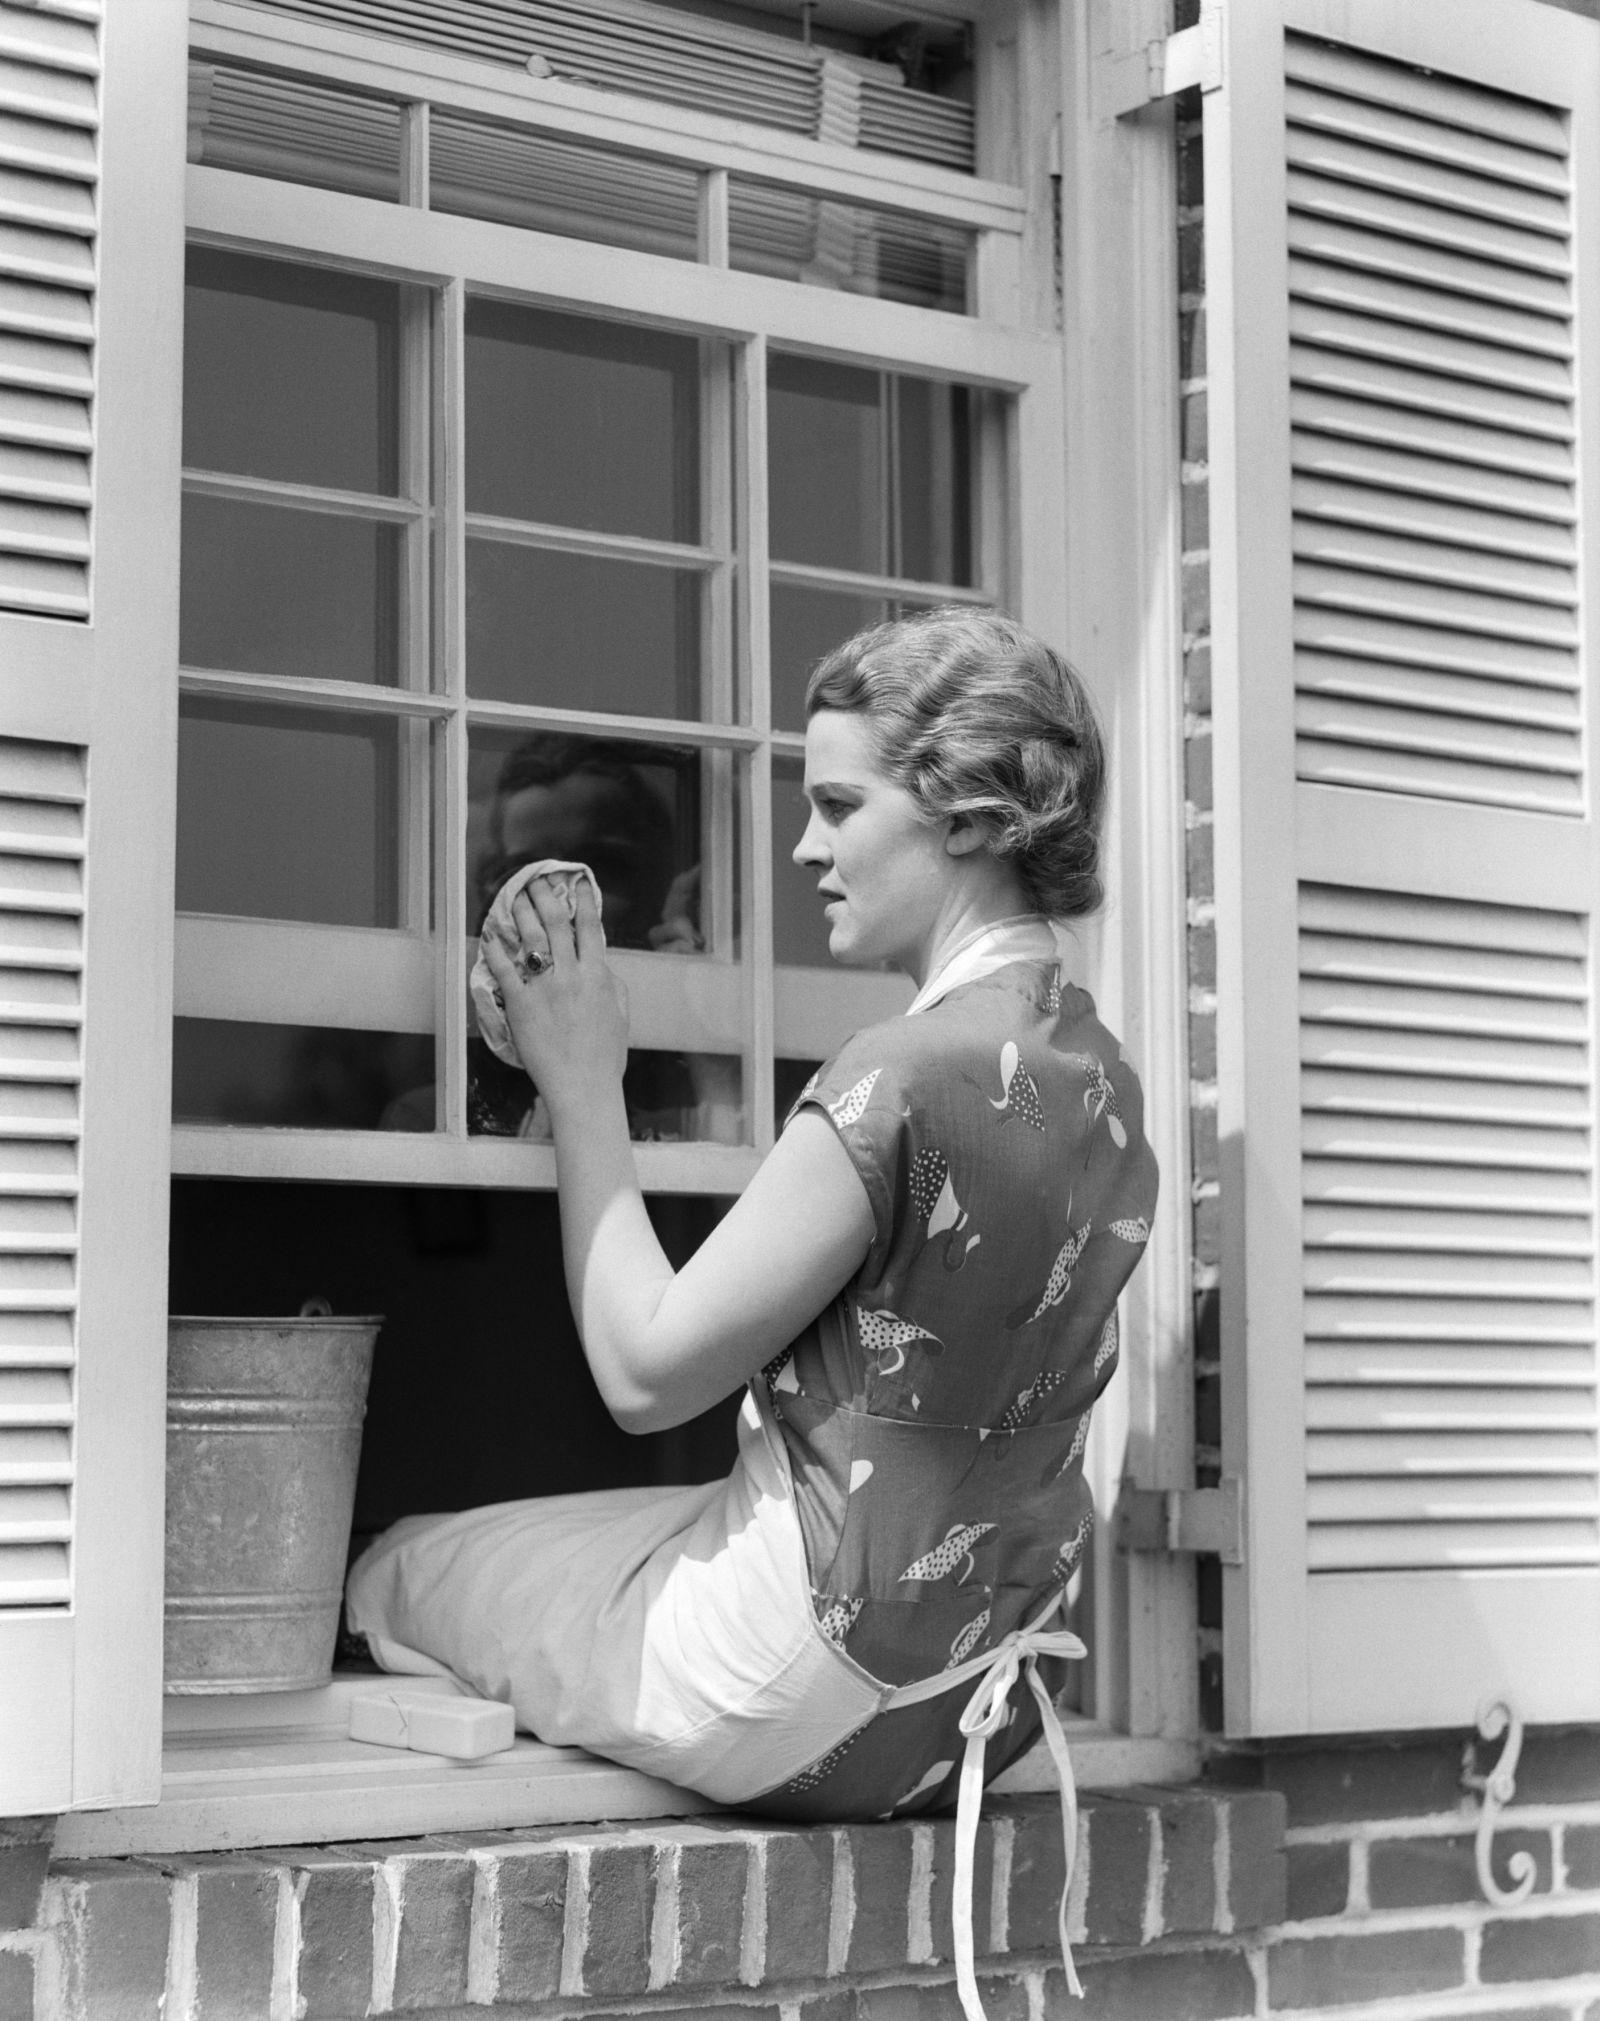 12 Housekeeping Secrets To Steal From Grandma Washing Windows